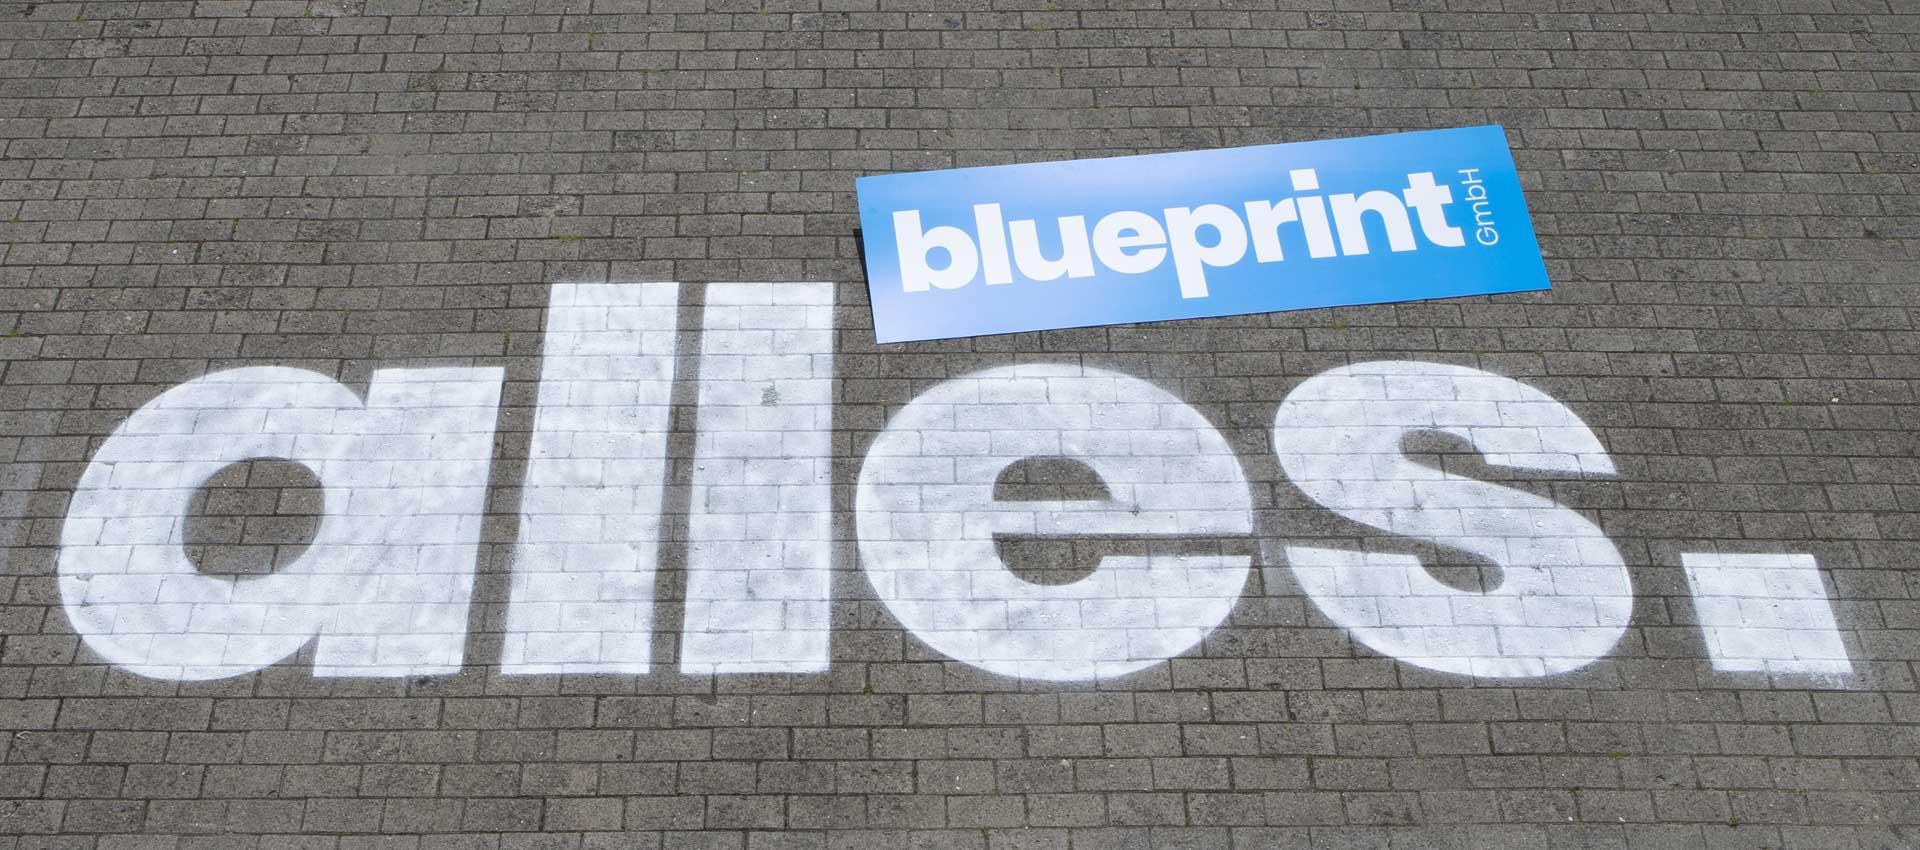 Alles blueprint - Bannerbild